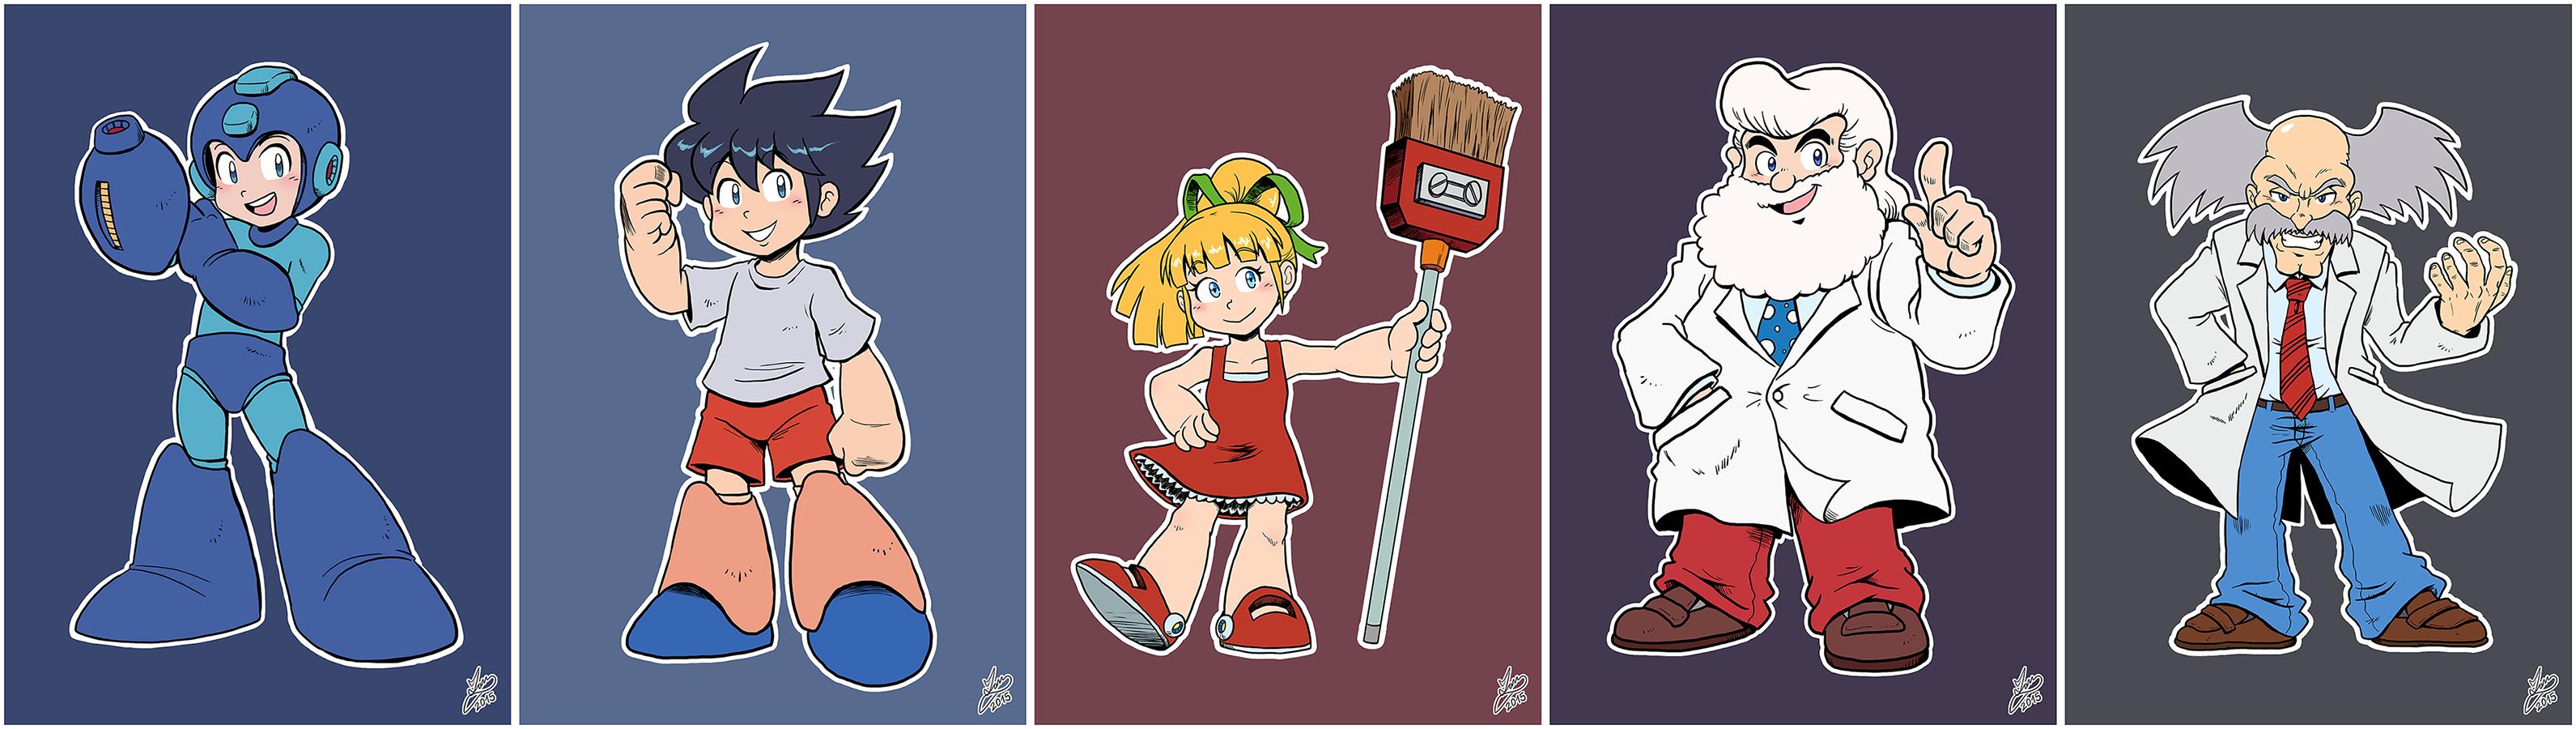 Daily Rockman - Rockman 1 Characters by IanDimas